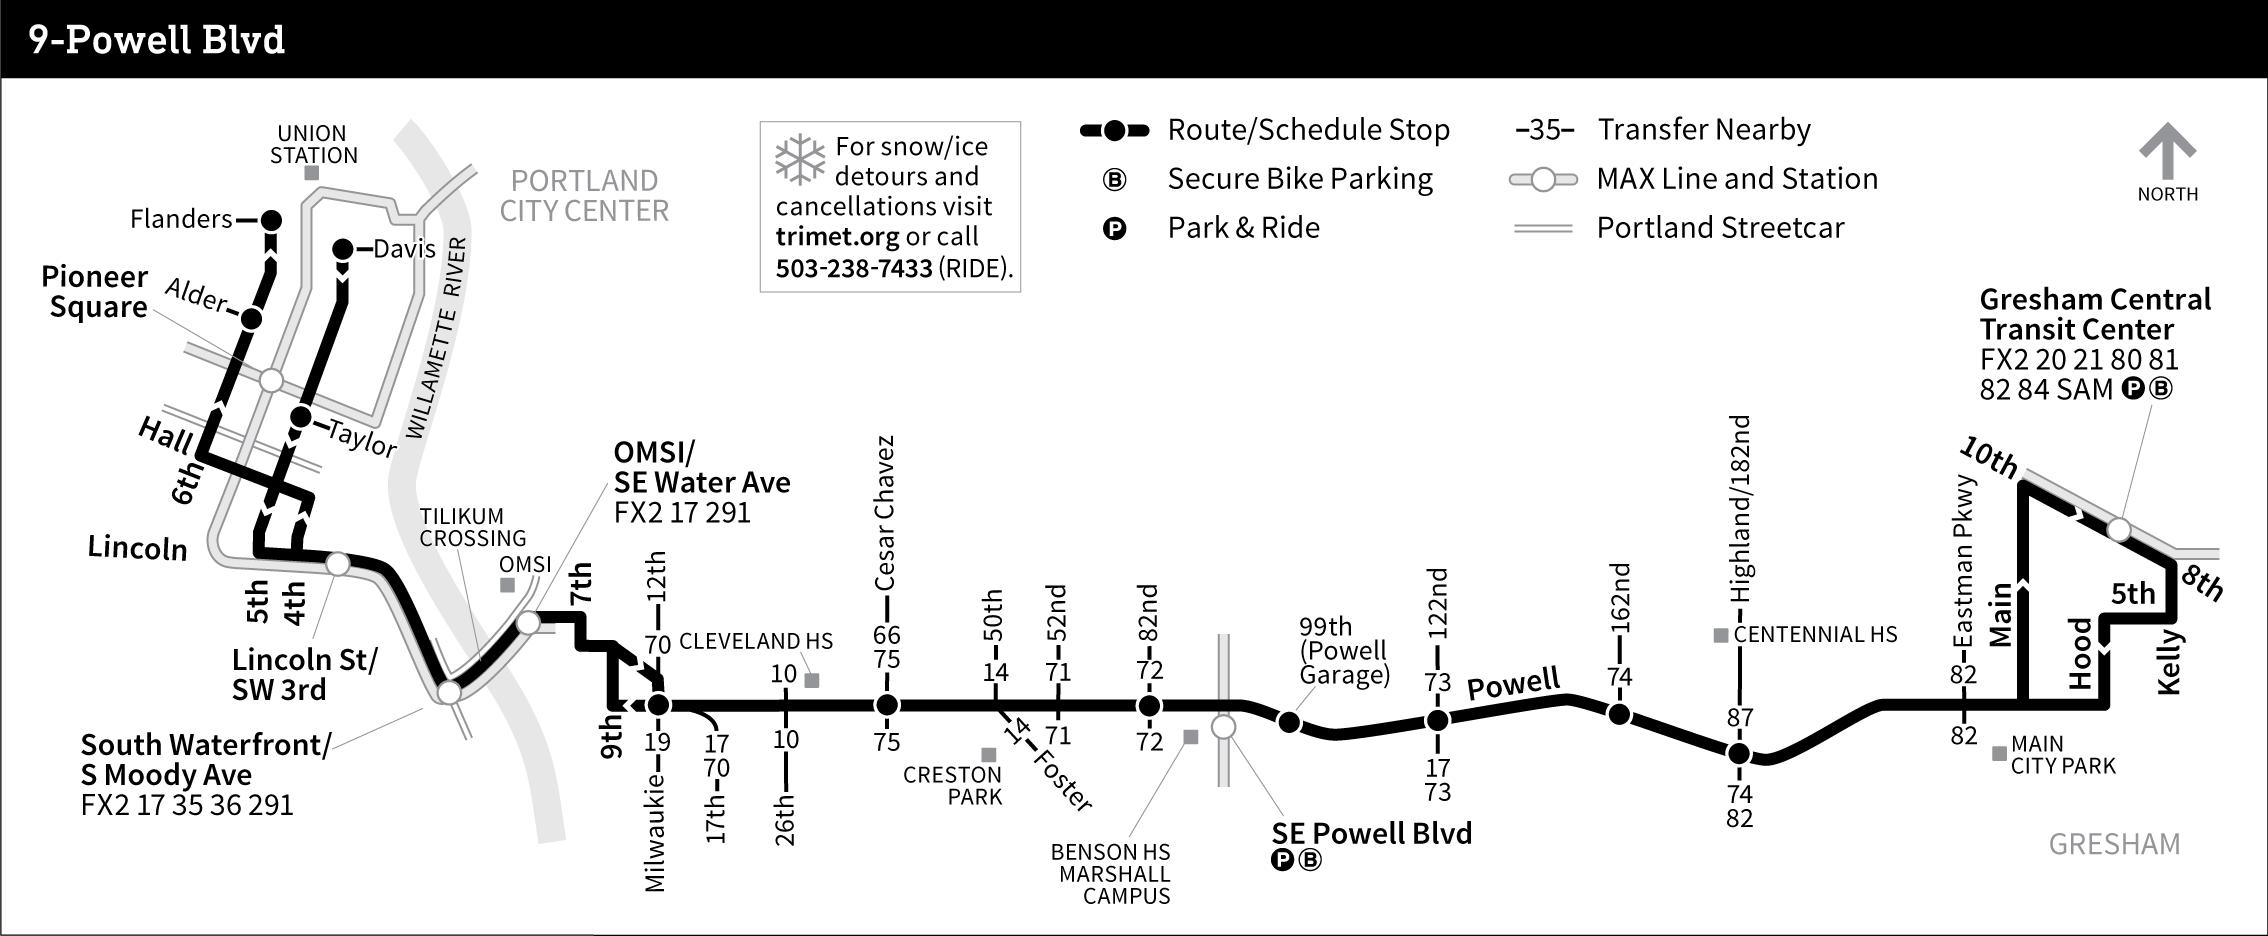 9-Powell Blvd on